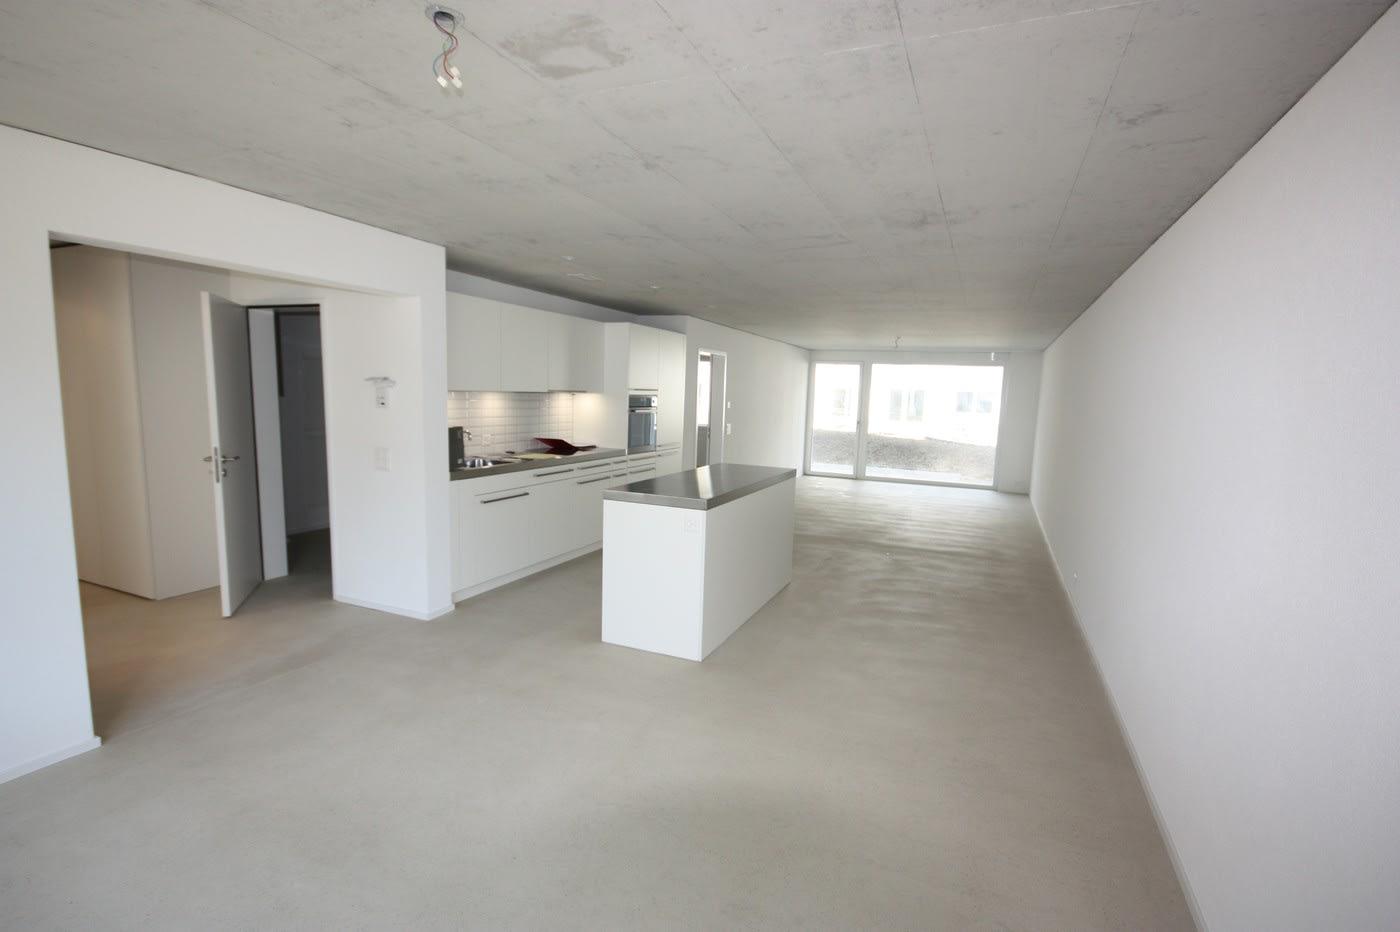 Miete: Ideale Single-Wohnung